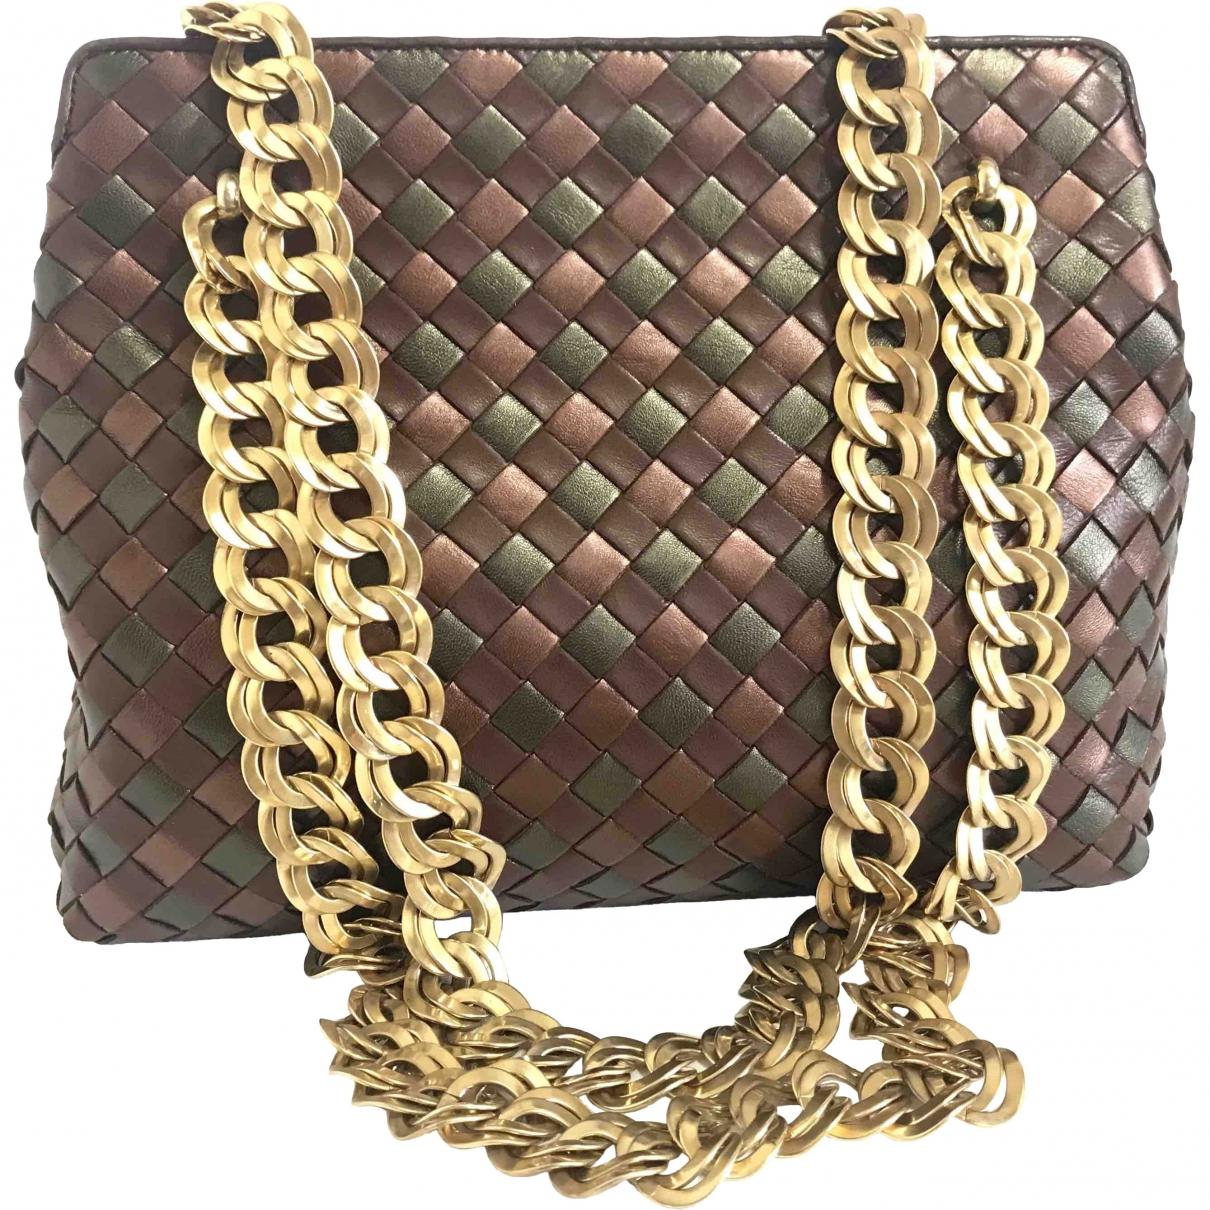 Bottega Veneta \N Metallic Leather handbag for Women \N